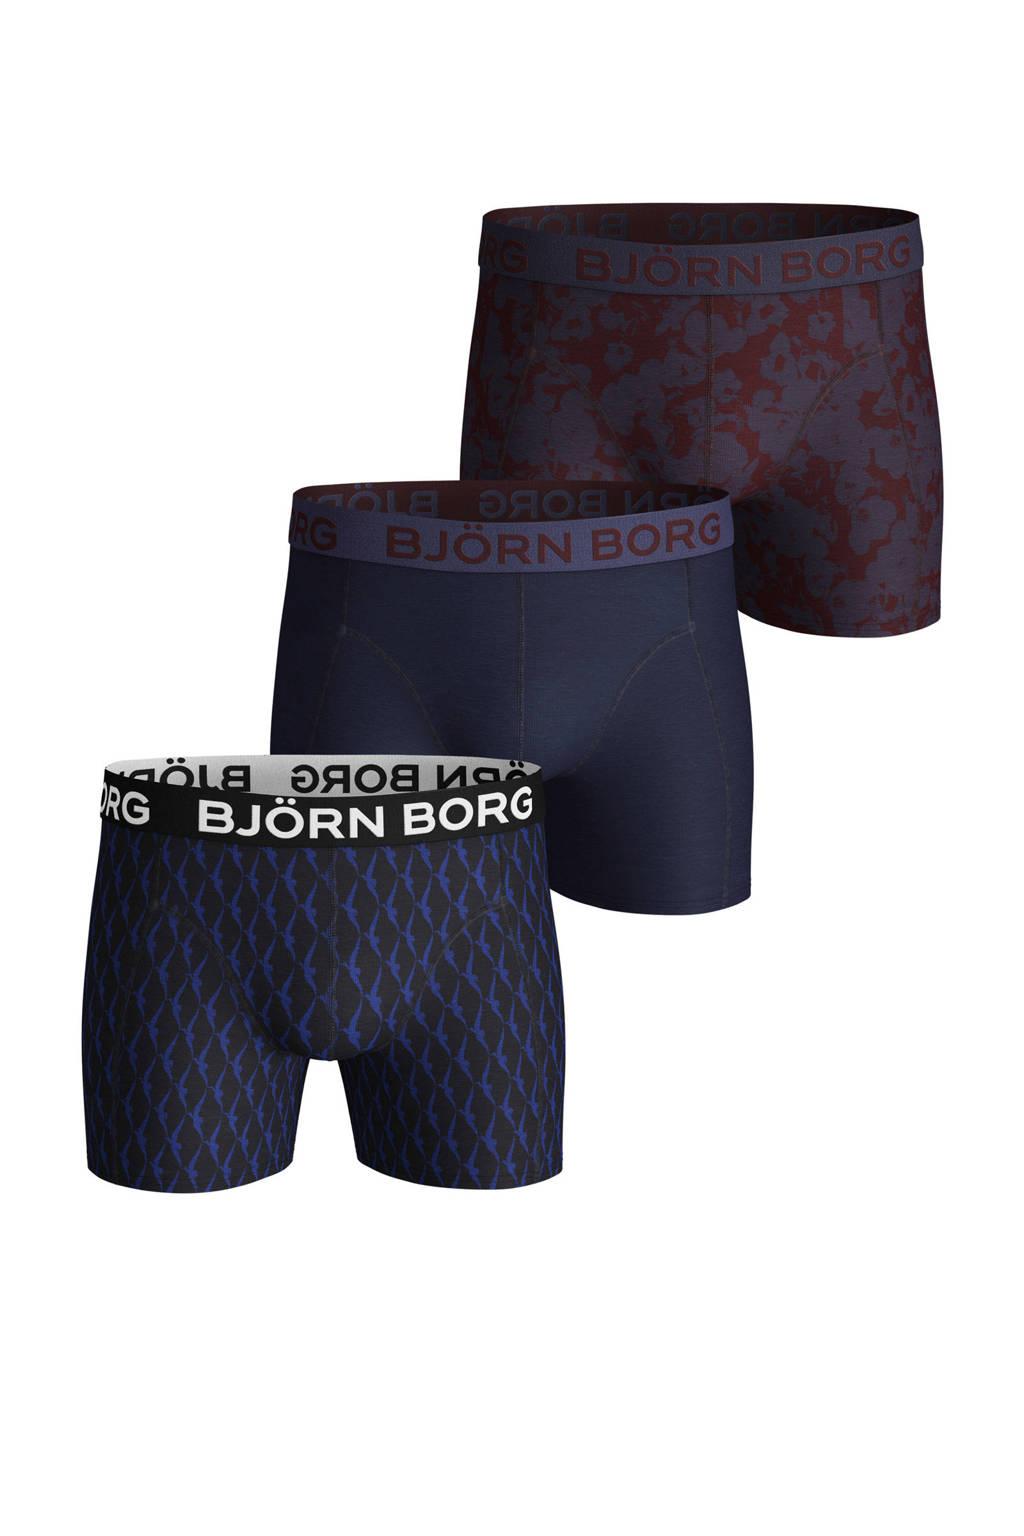 Björn Borg boxershort (set van 3), Donkerblauw